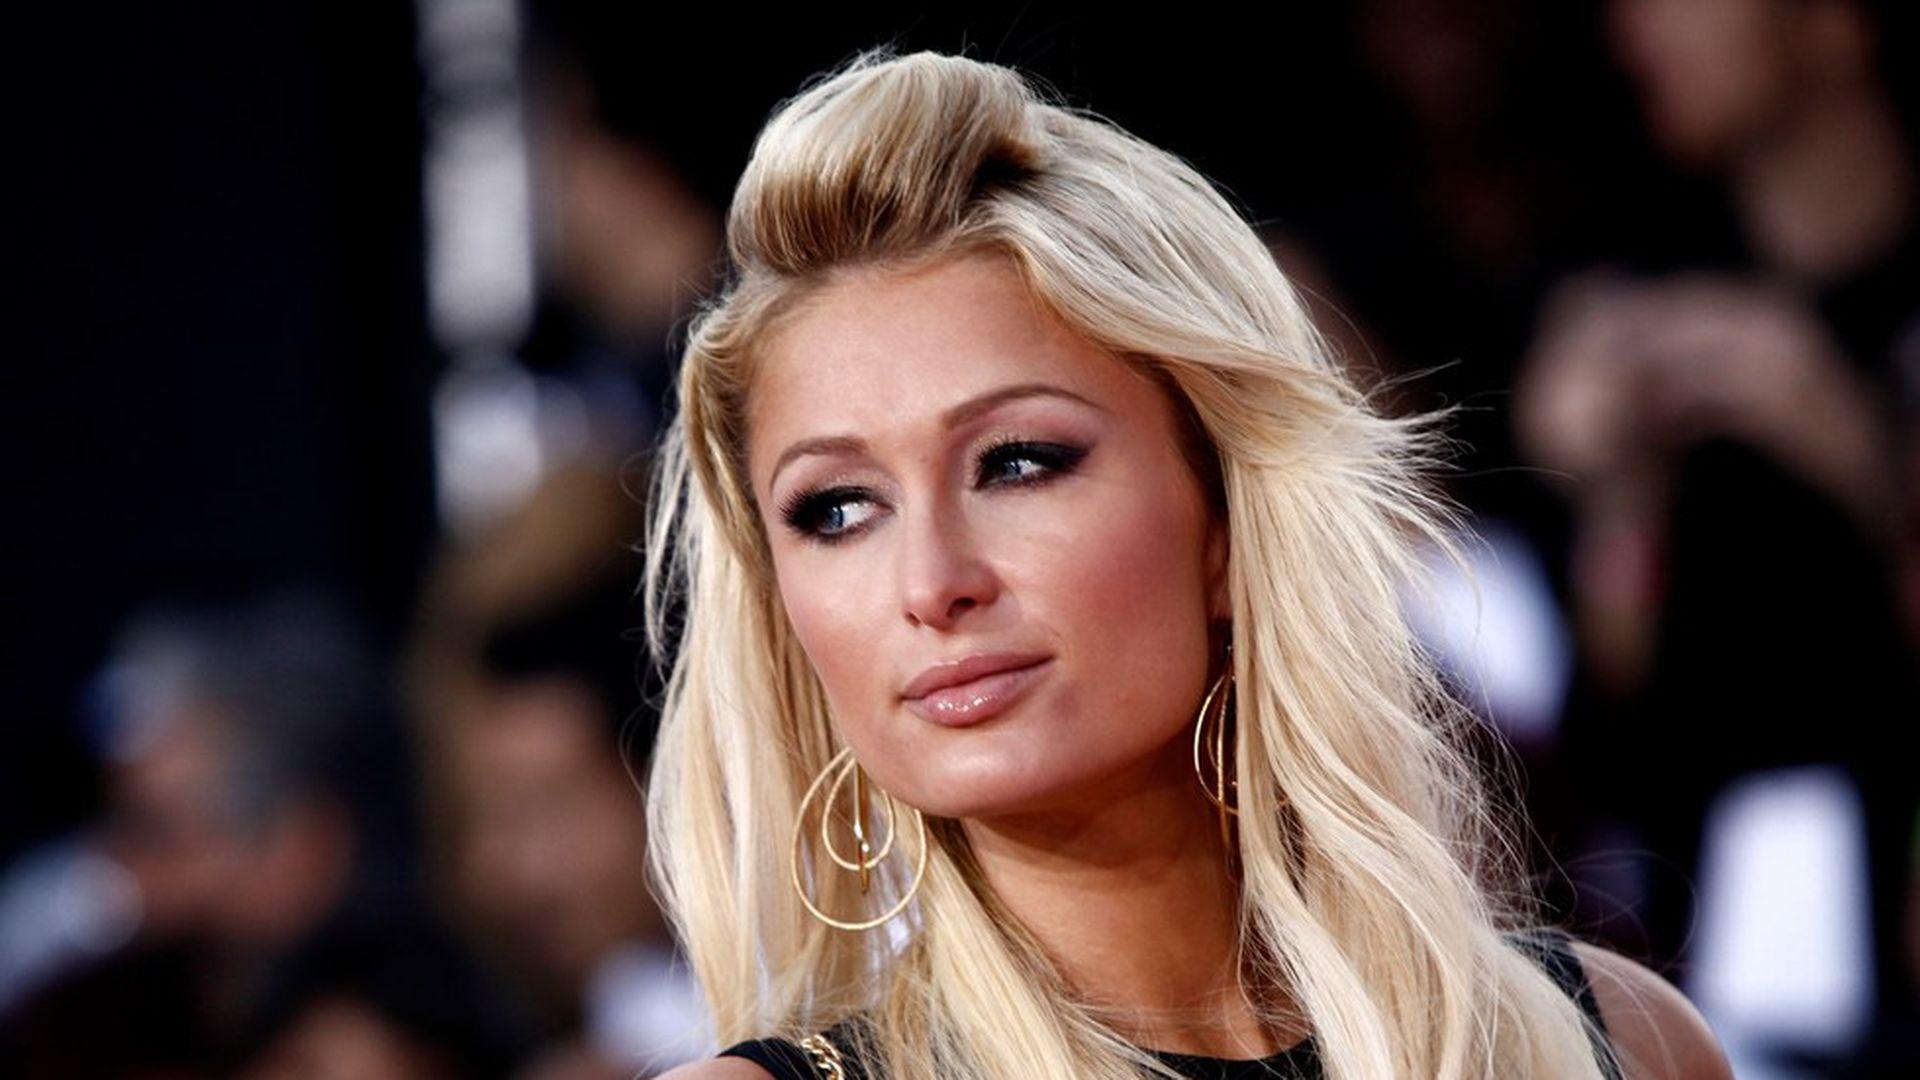 гламурная американка блондинка шерзингер